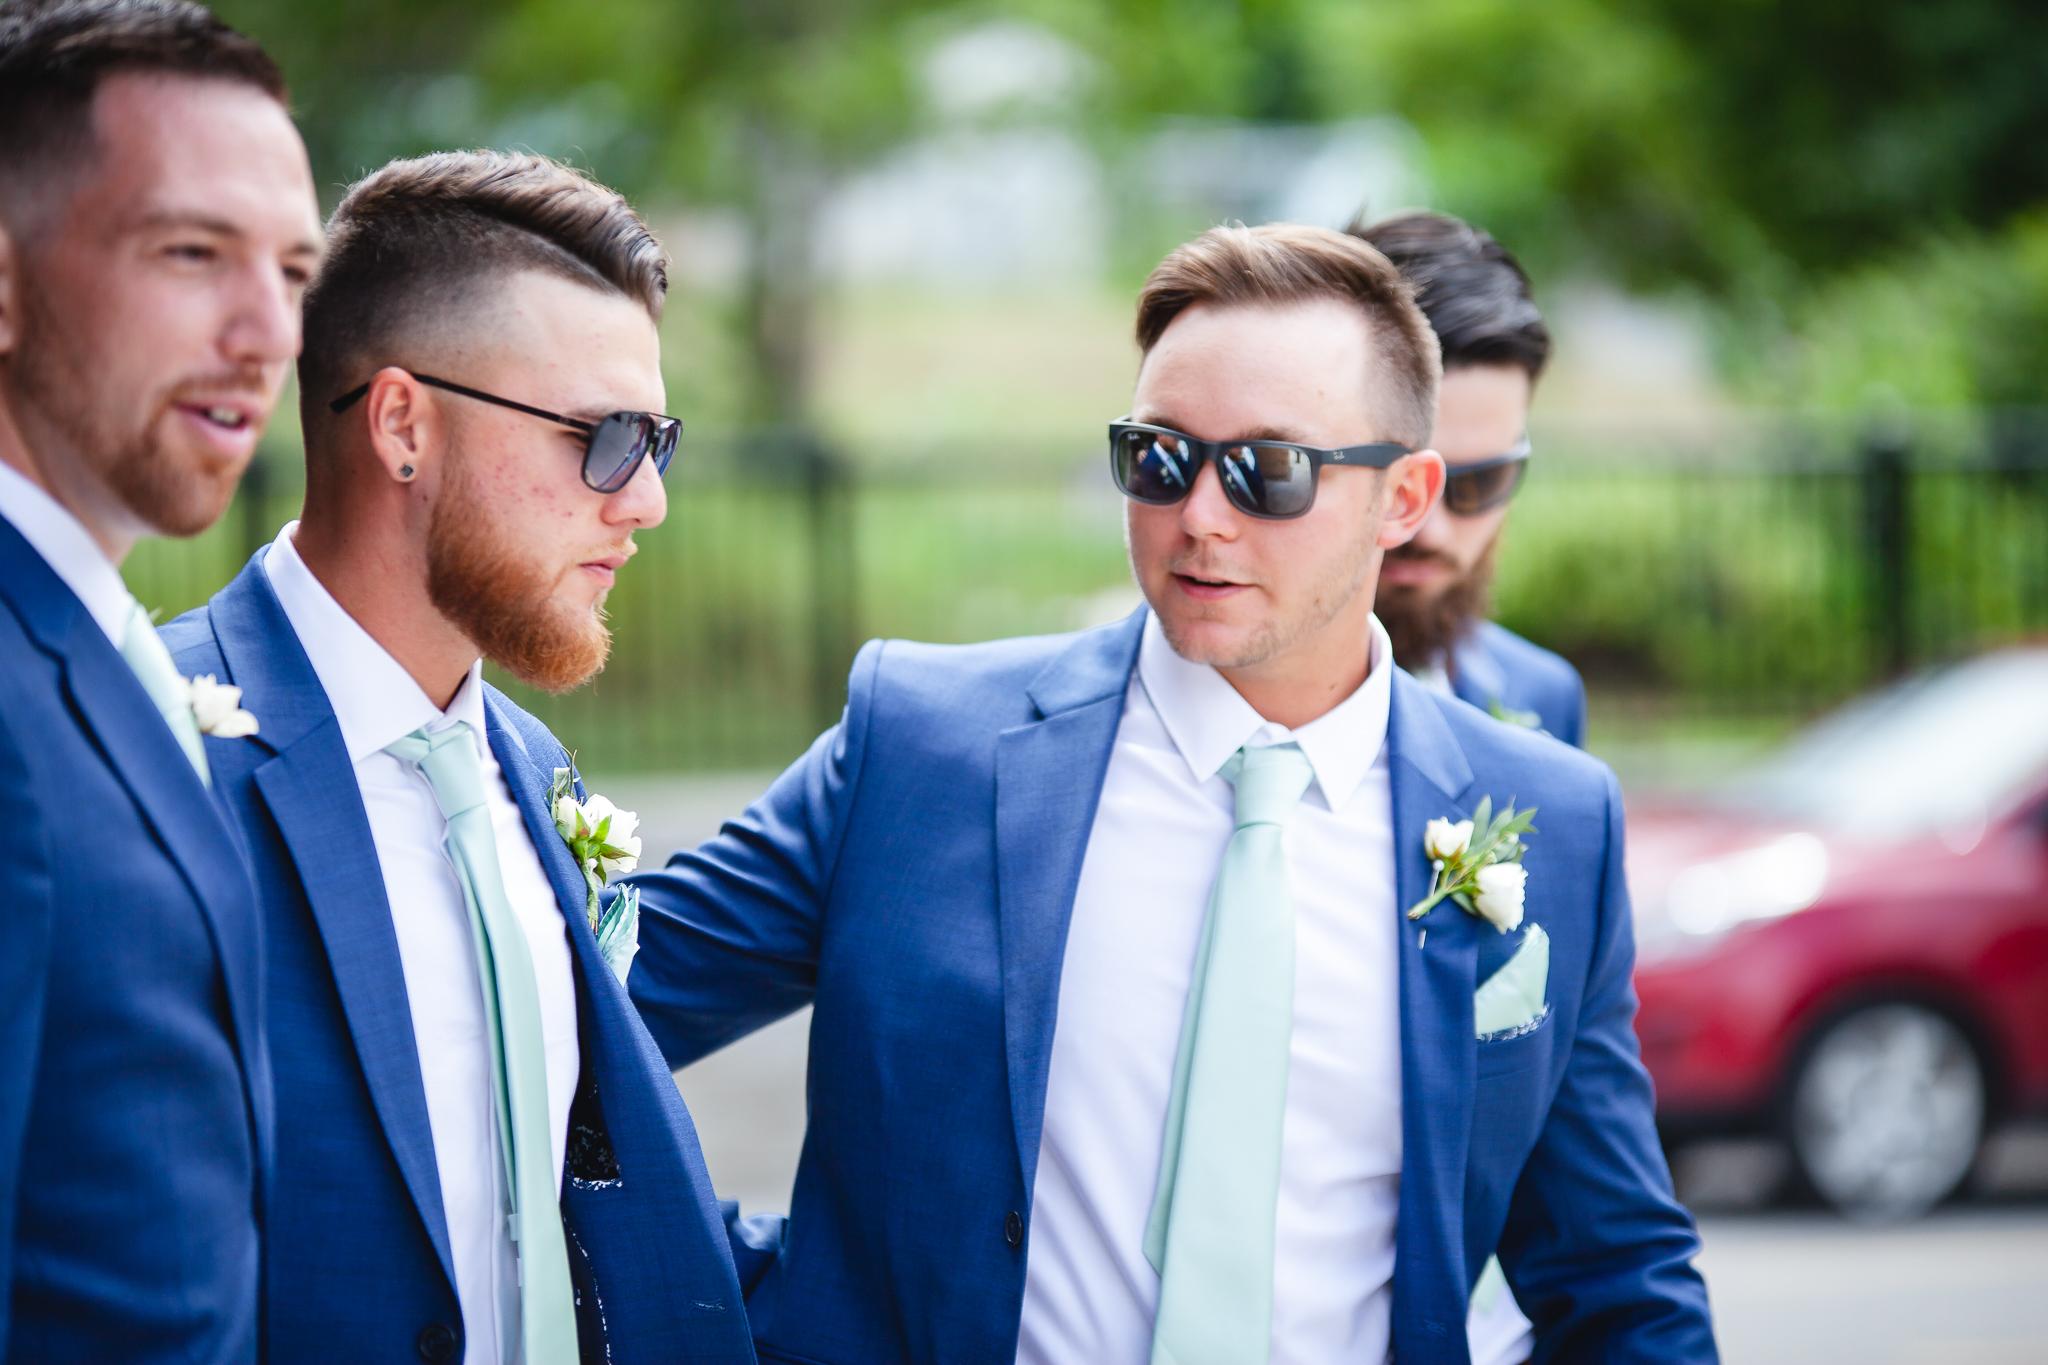 Amy D Photography- Barrie Wedding Photography- Wedding Ceremony- Wedding Photography- Barrie Weddings-5.jpg